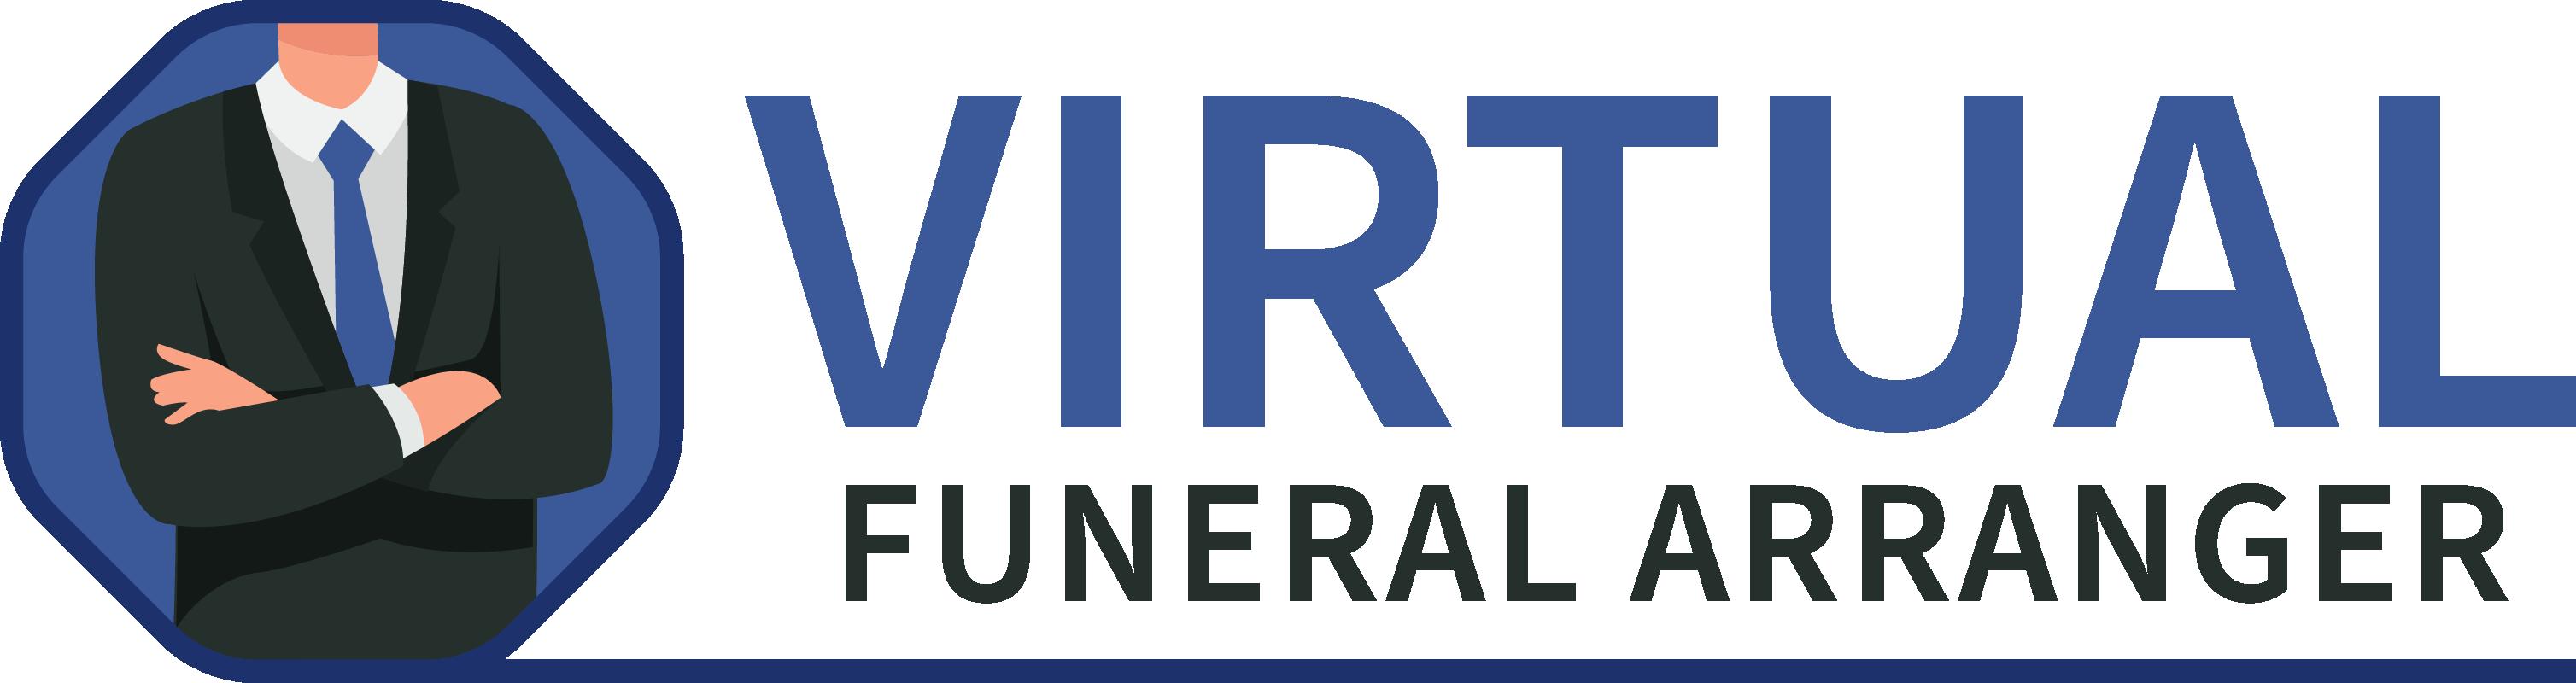 virtual funeral arranger